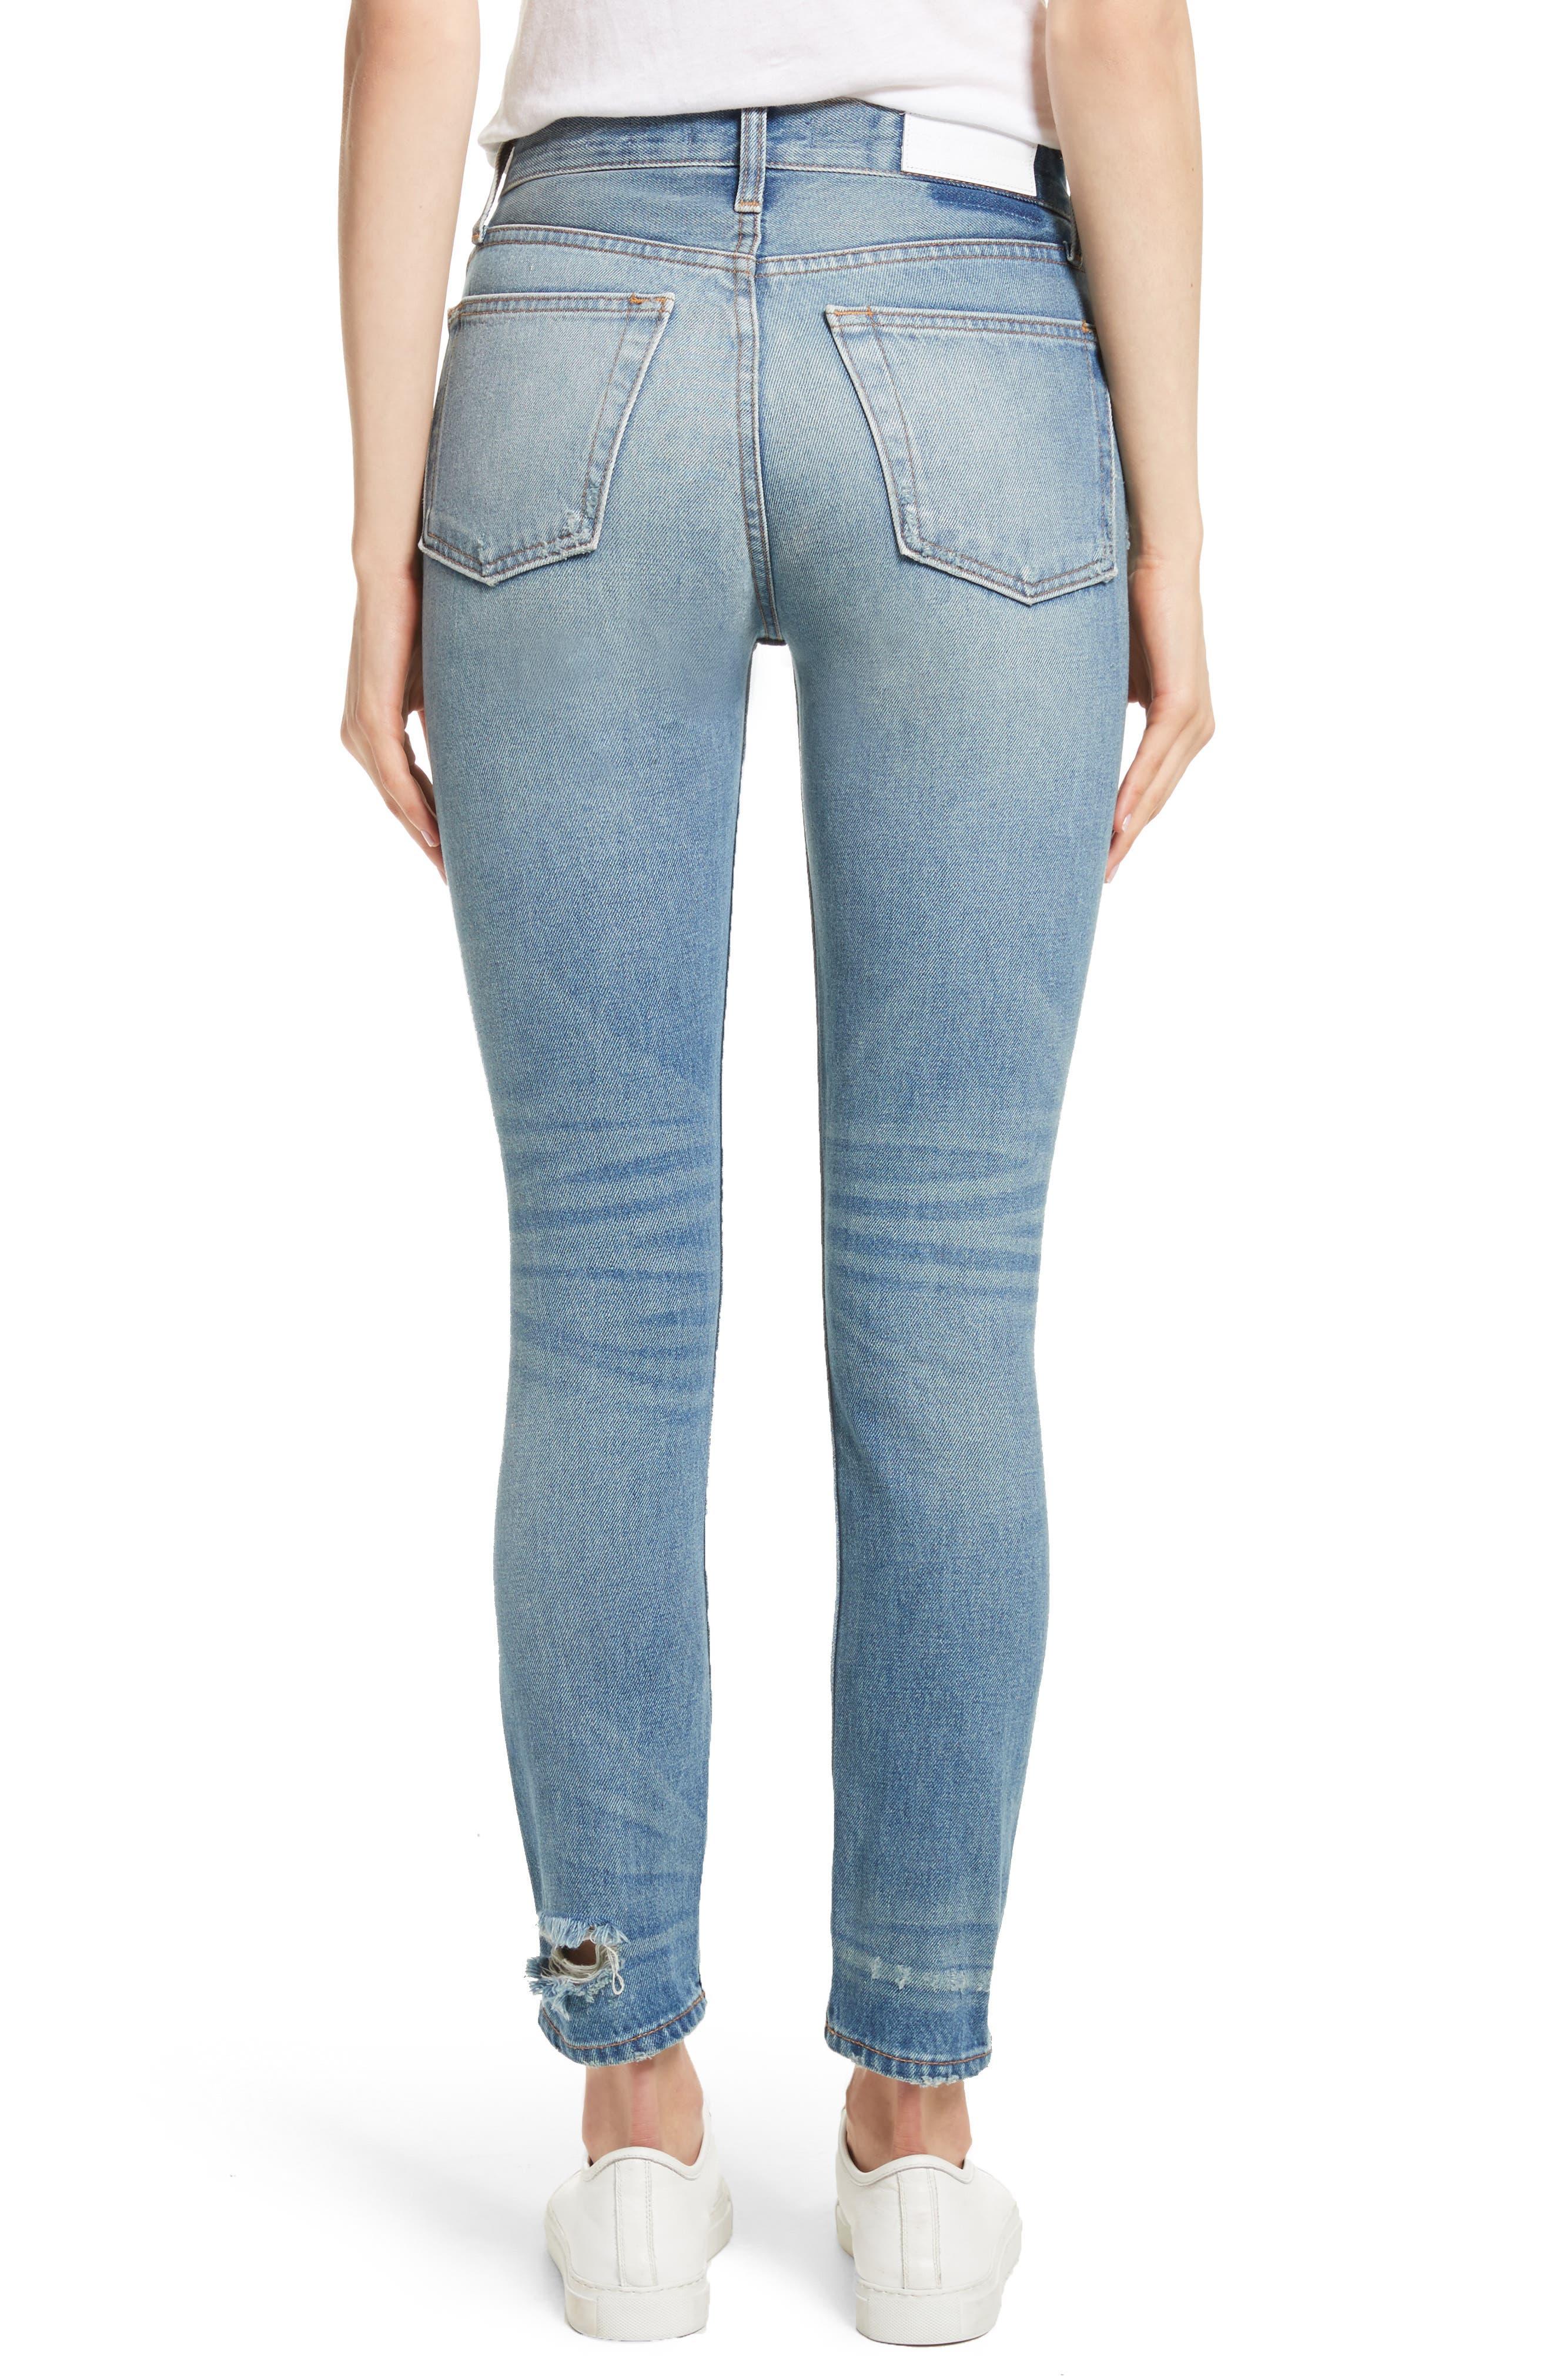 Originals High Waist Jeans,                             Alternate thumbnail 2, color,                             401